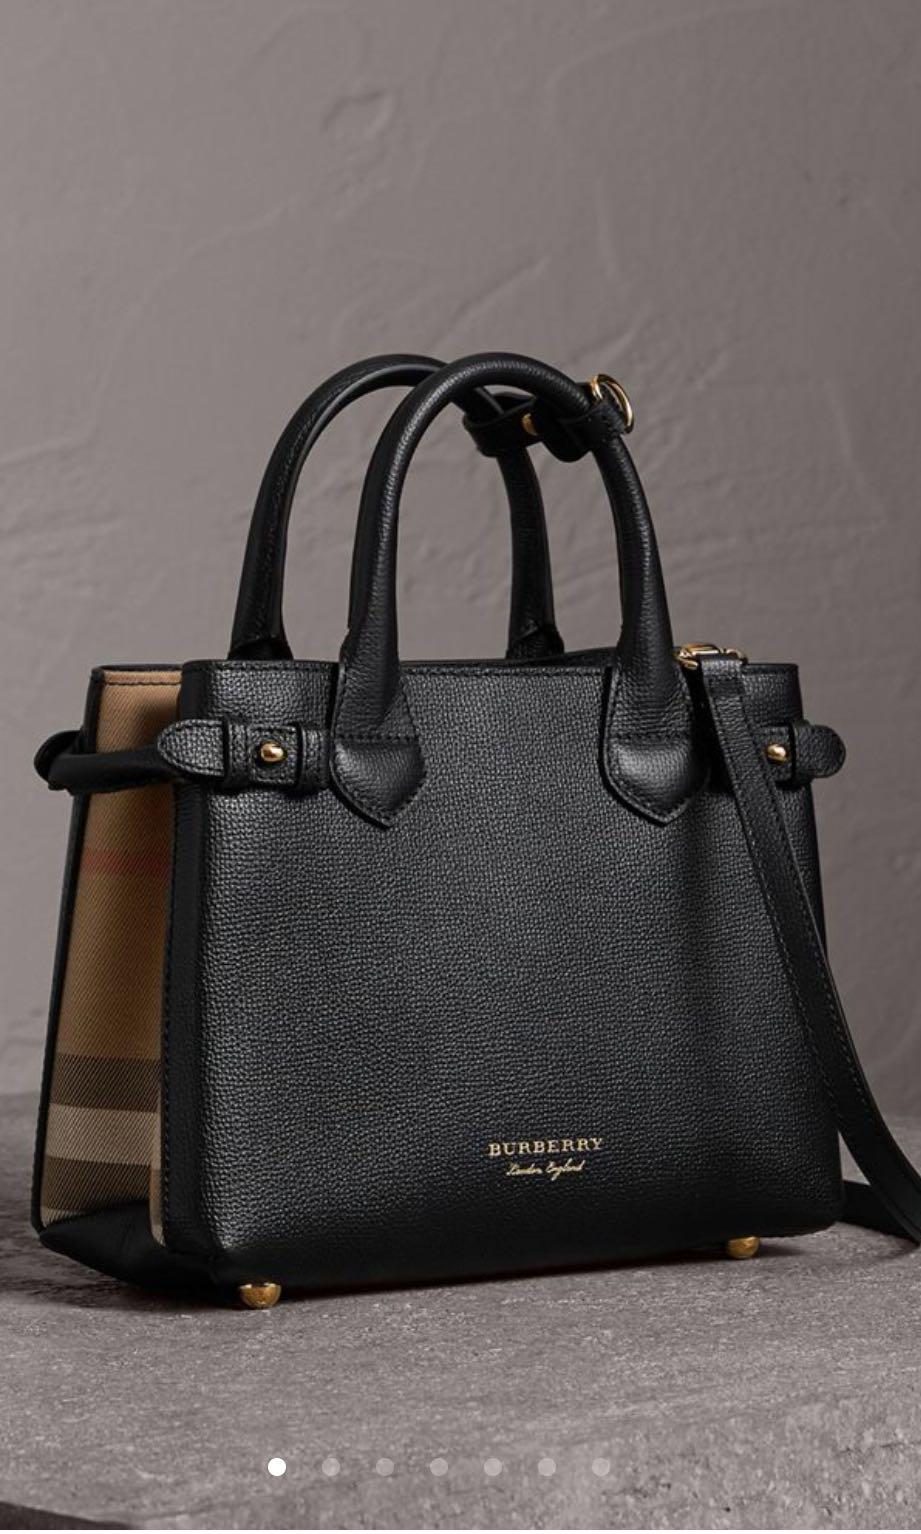 21c35b402155 Burberry banner mini, Luxury, Bags & Wallets, Handbags on Carousell